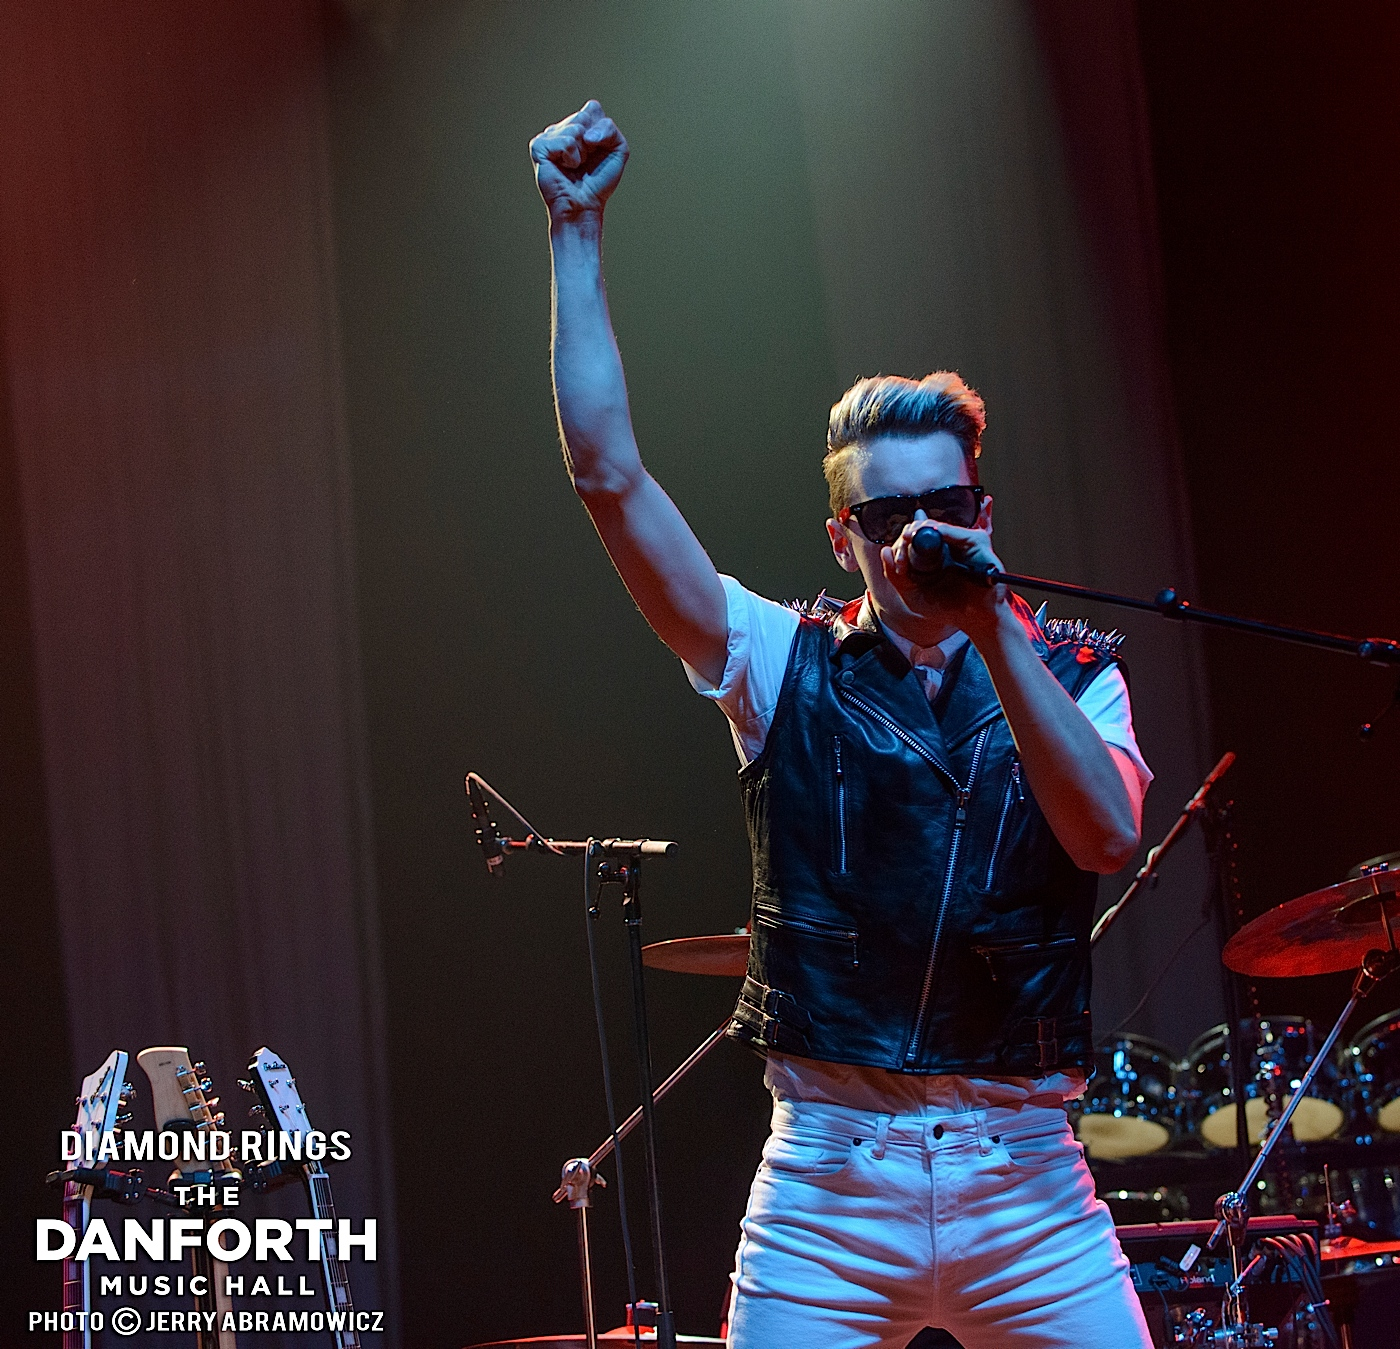 20130711 Diamond Rings at The Danforth Music Hall 0095